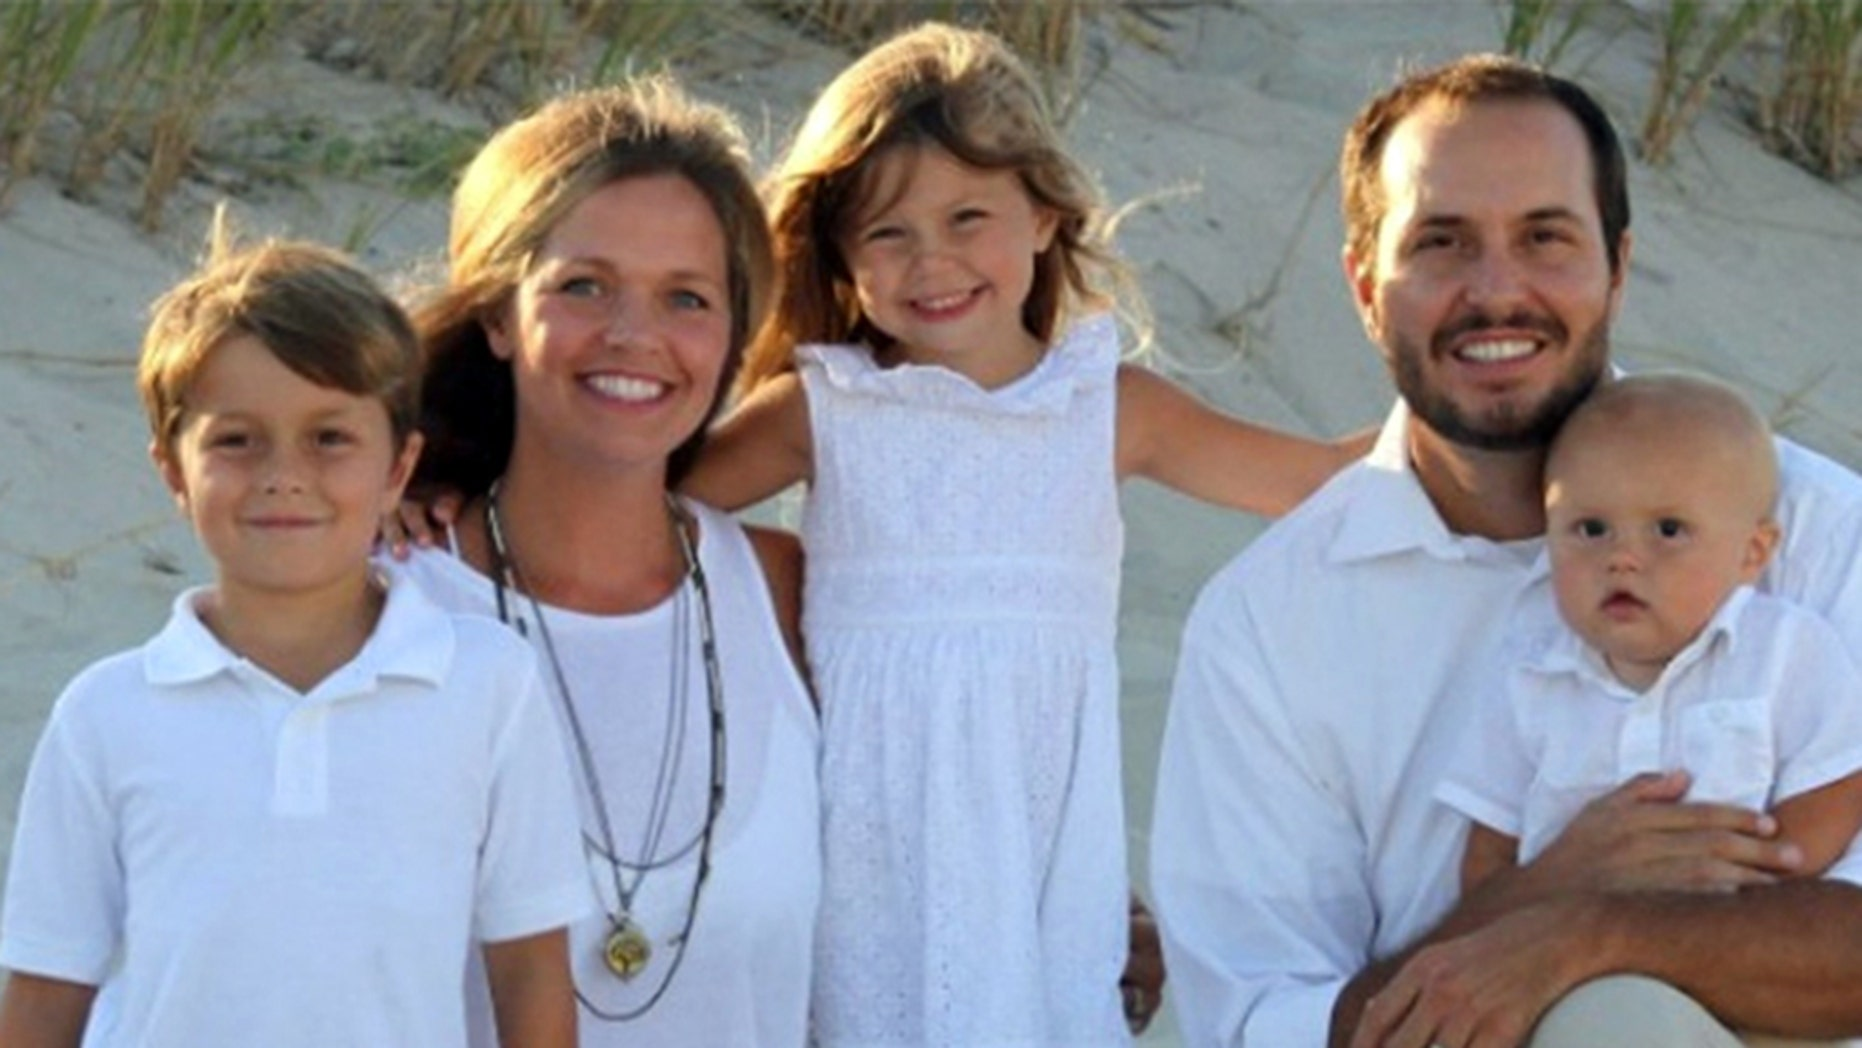 Katherine and Peter Martorana and their children.